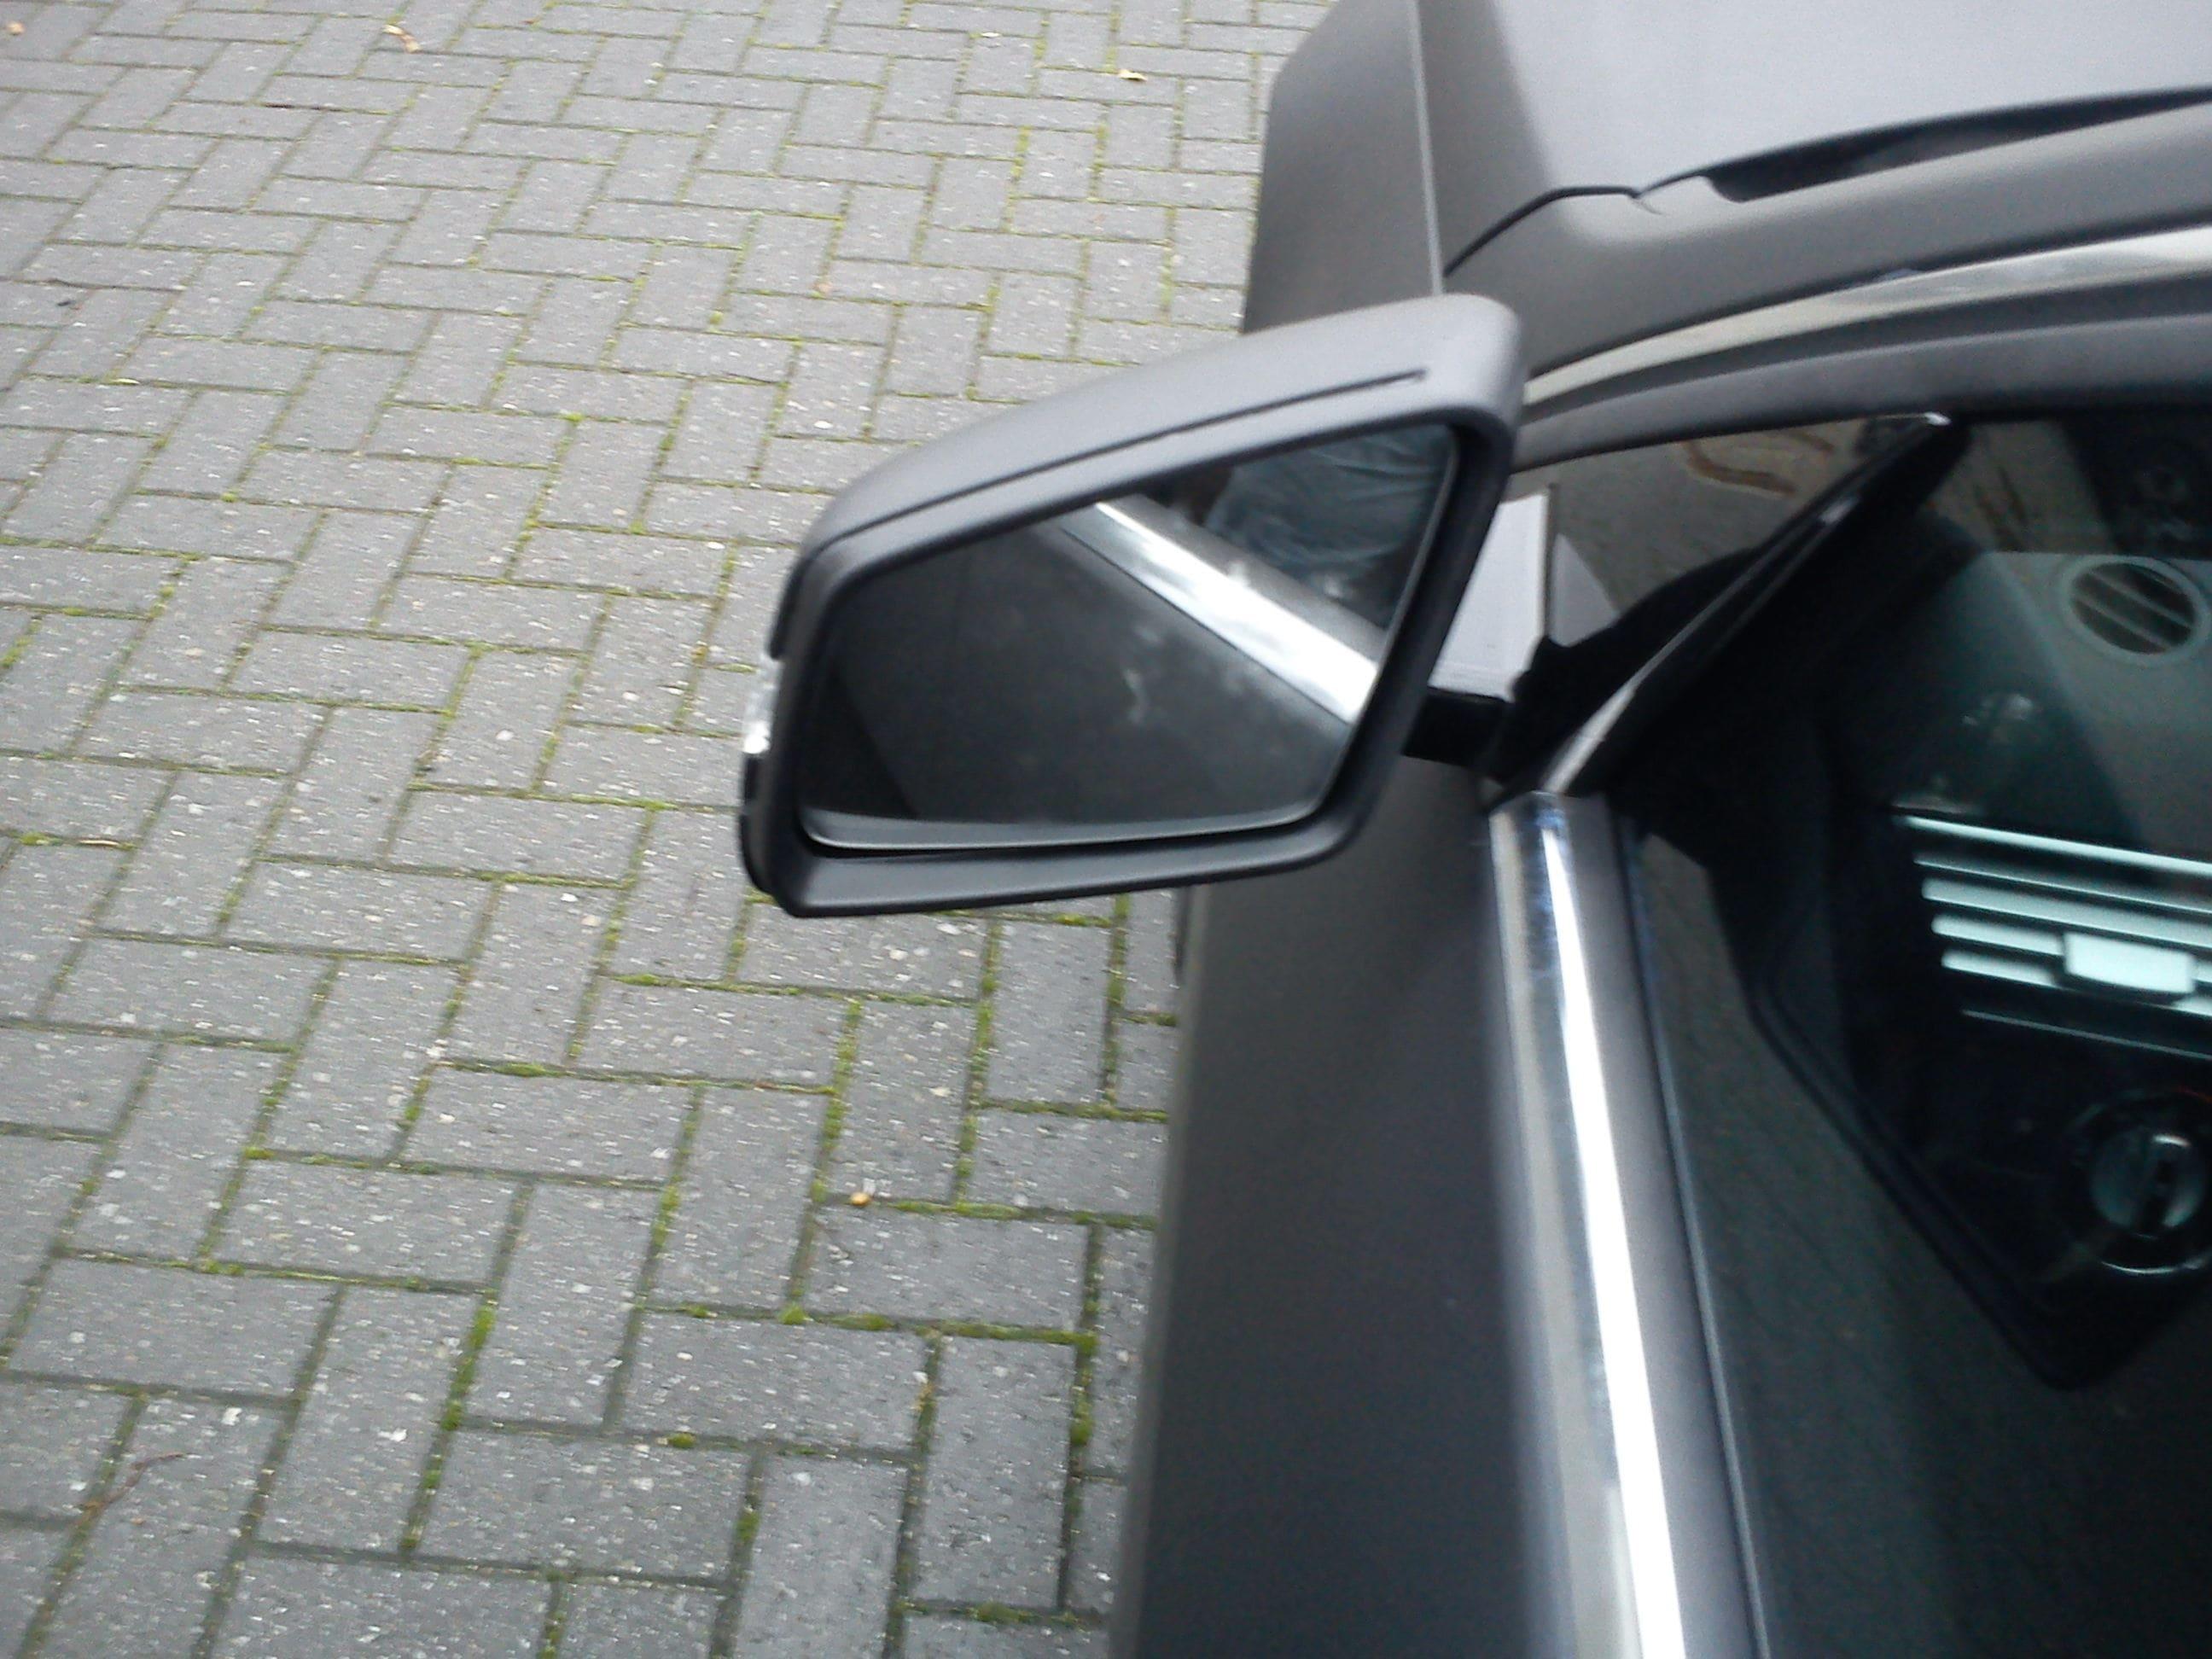 Mercedes E320 met Mat Zwarte Wrap, Carwrapping door Wrapmyride.nu Foto-nr:6237, ©2020